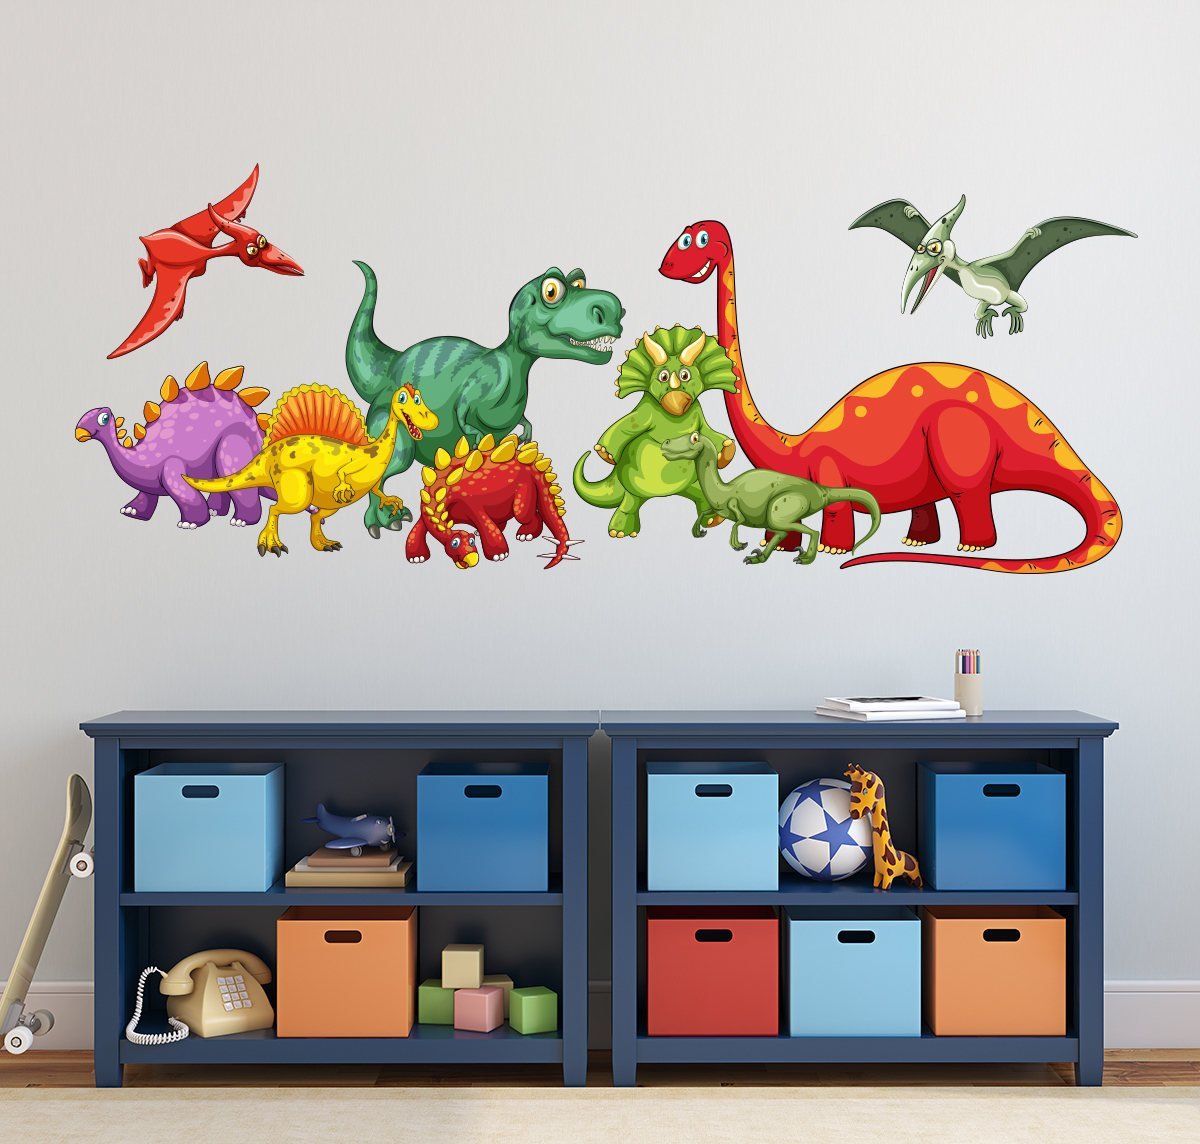 Dinosaurs Wall Decal - Kids Boys Bedroom Wall Art - Cute Dinosaurs Nursery Wall Decal - Dinosaur Themed Vinyl Wall Sticker (56